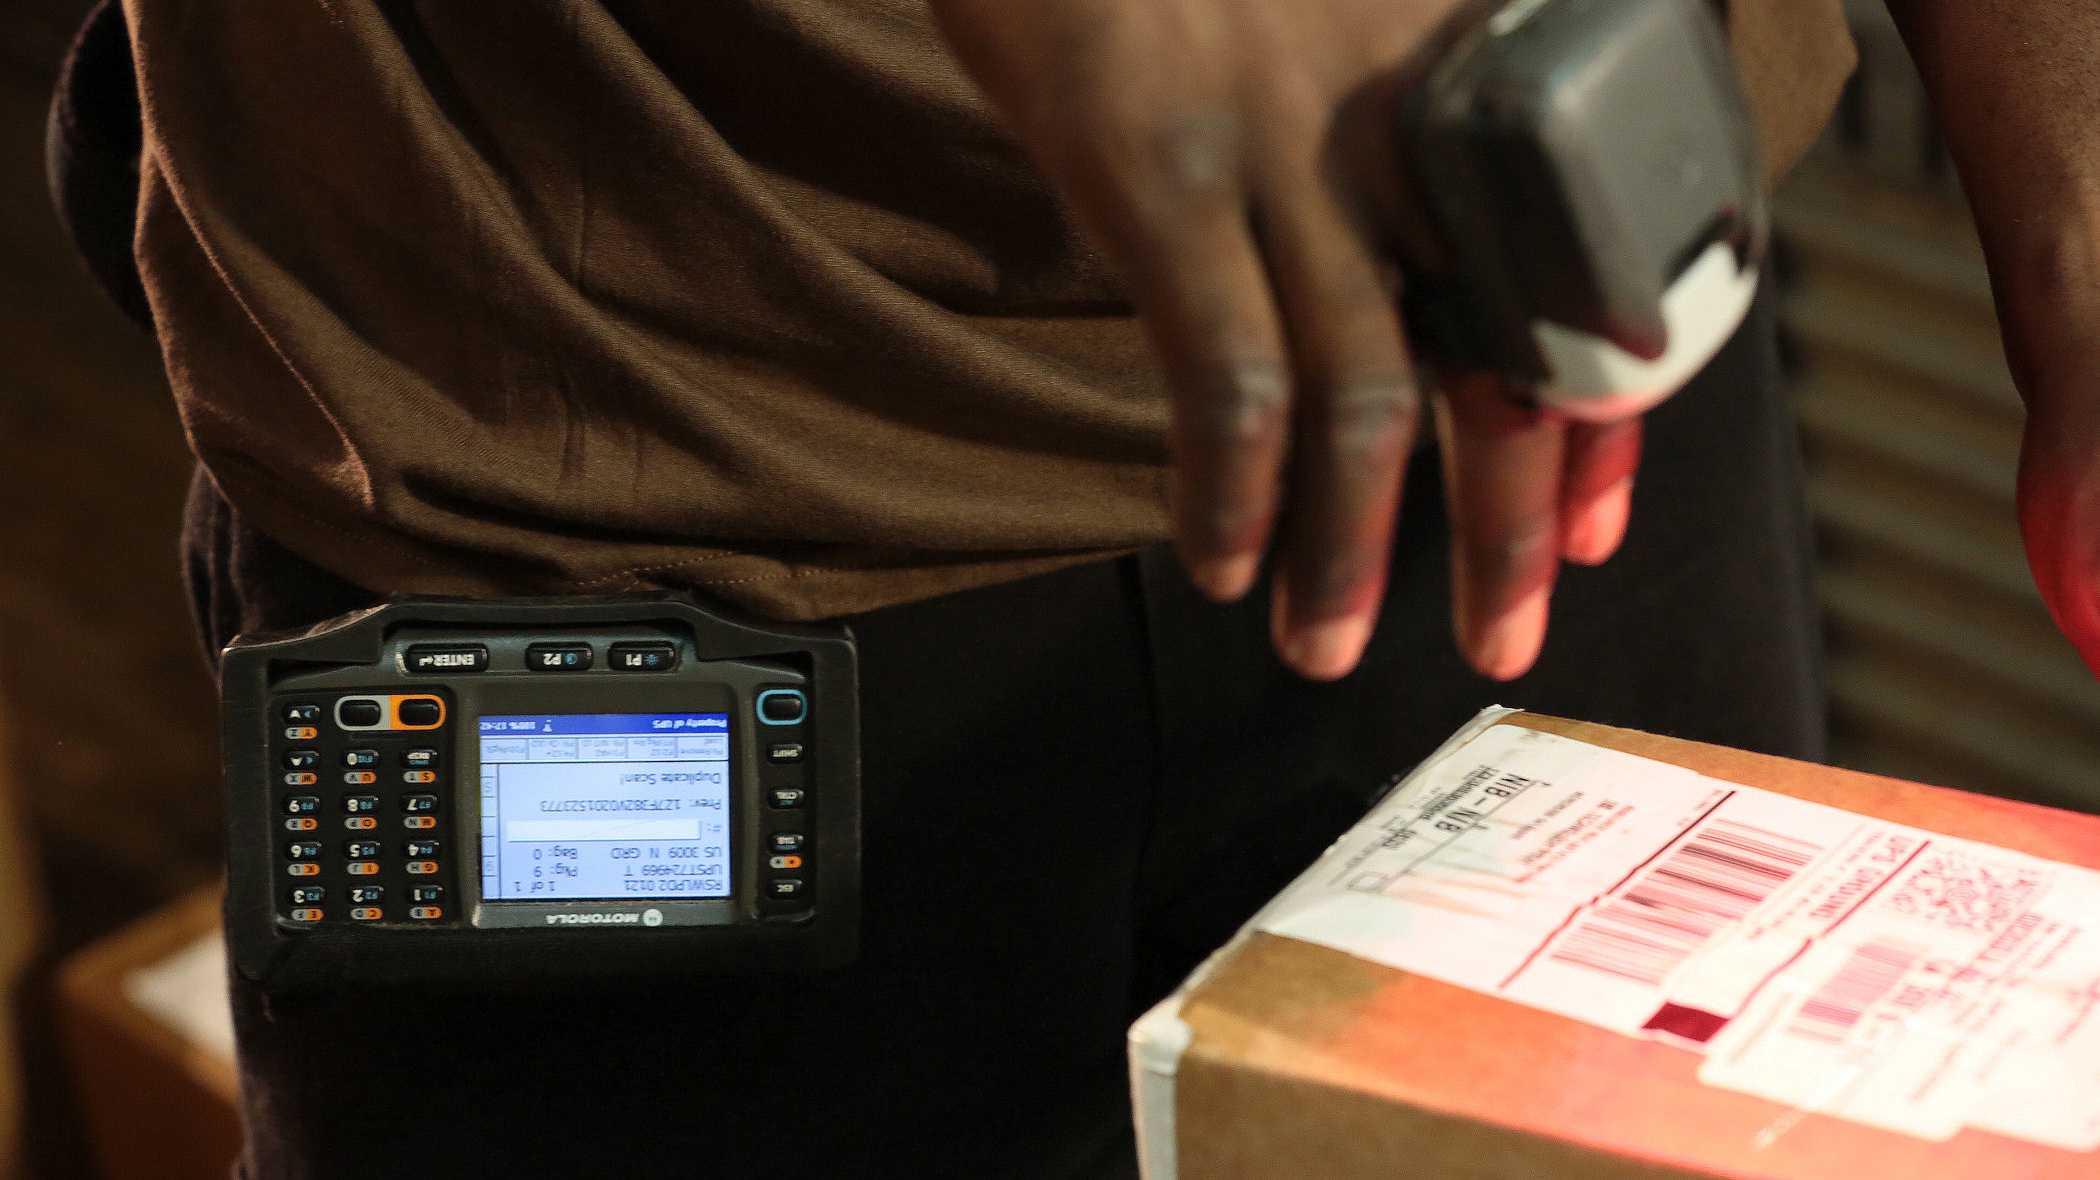 Onlinehandel: Deutsche bekommen deutlich mehr Pakete als andere Nationen